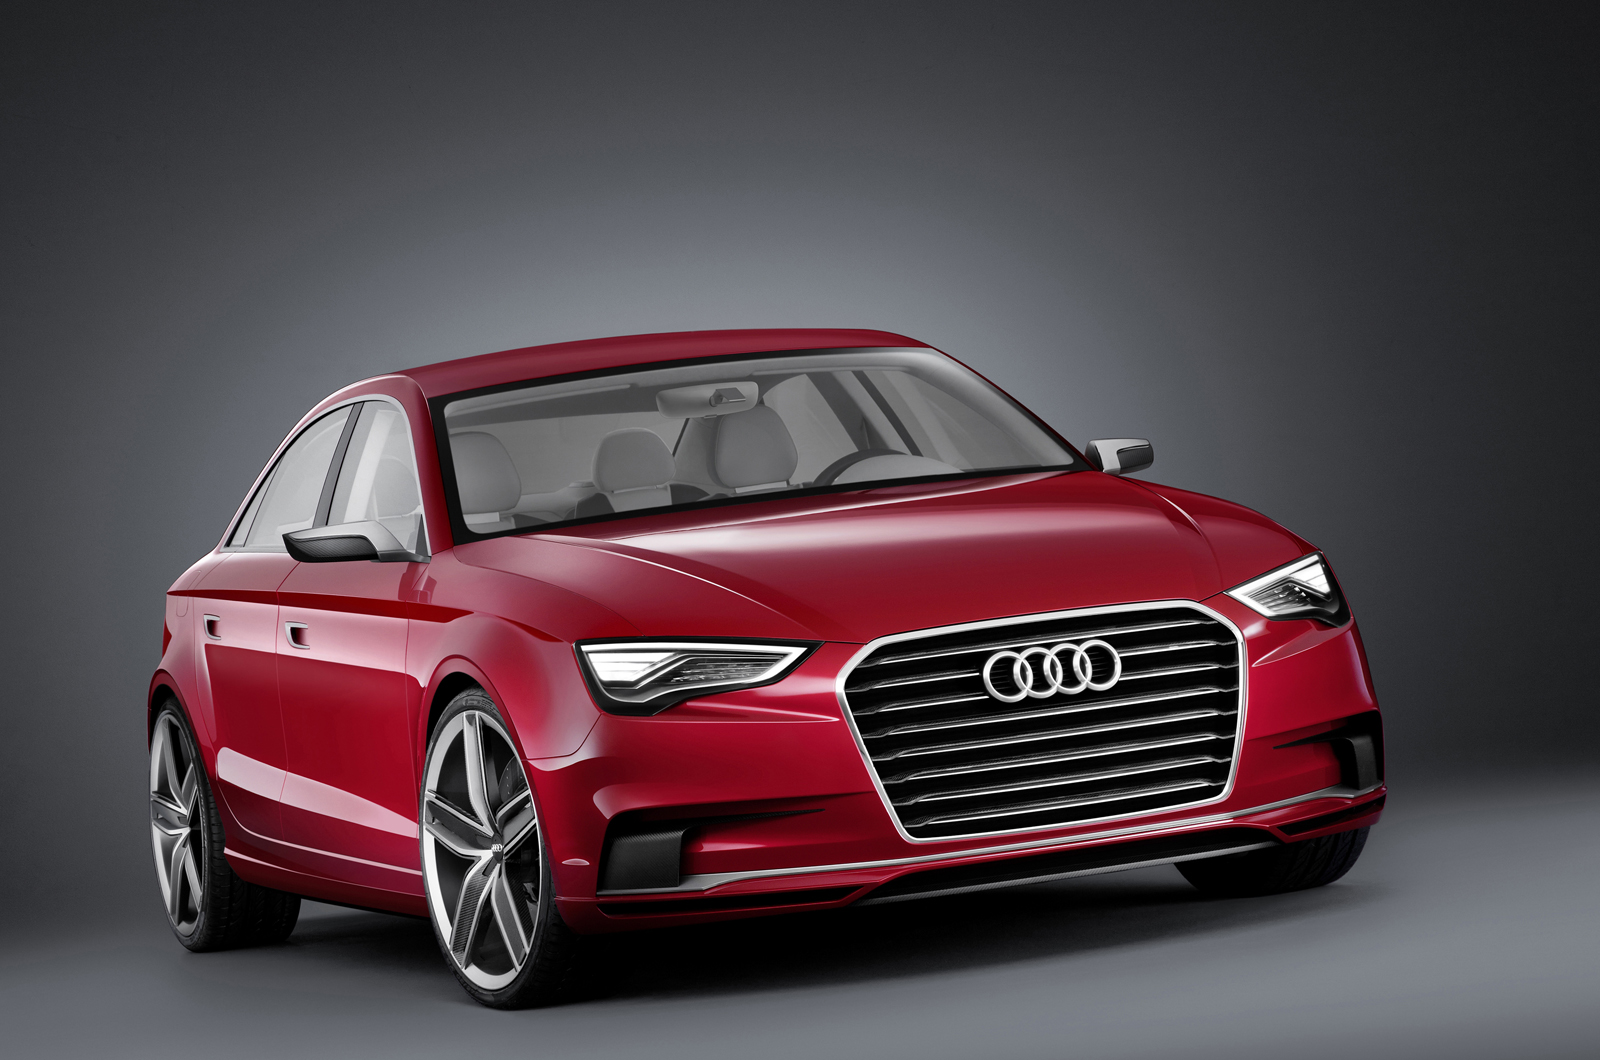 Shanghai motor show 2013: Audi S3 saloon   Autocar